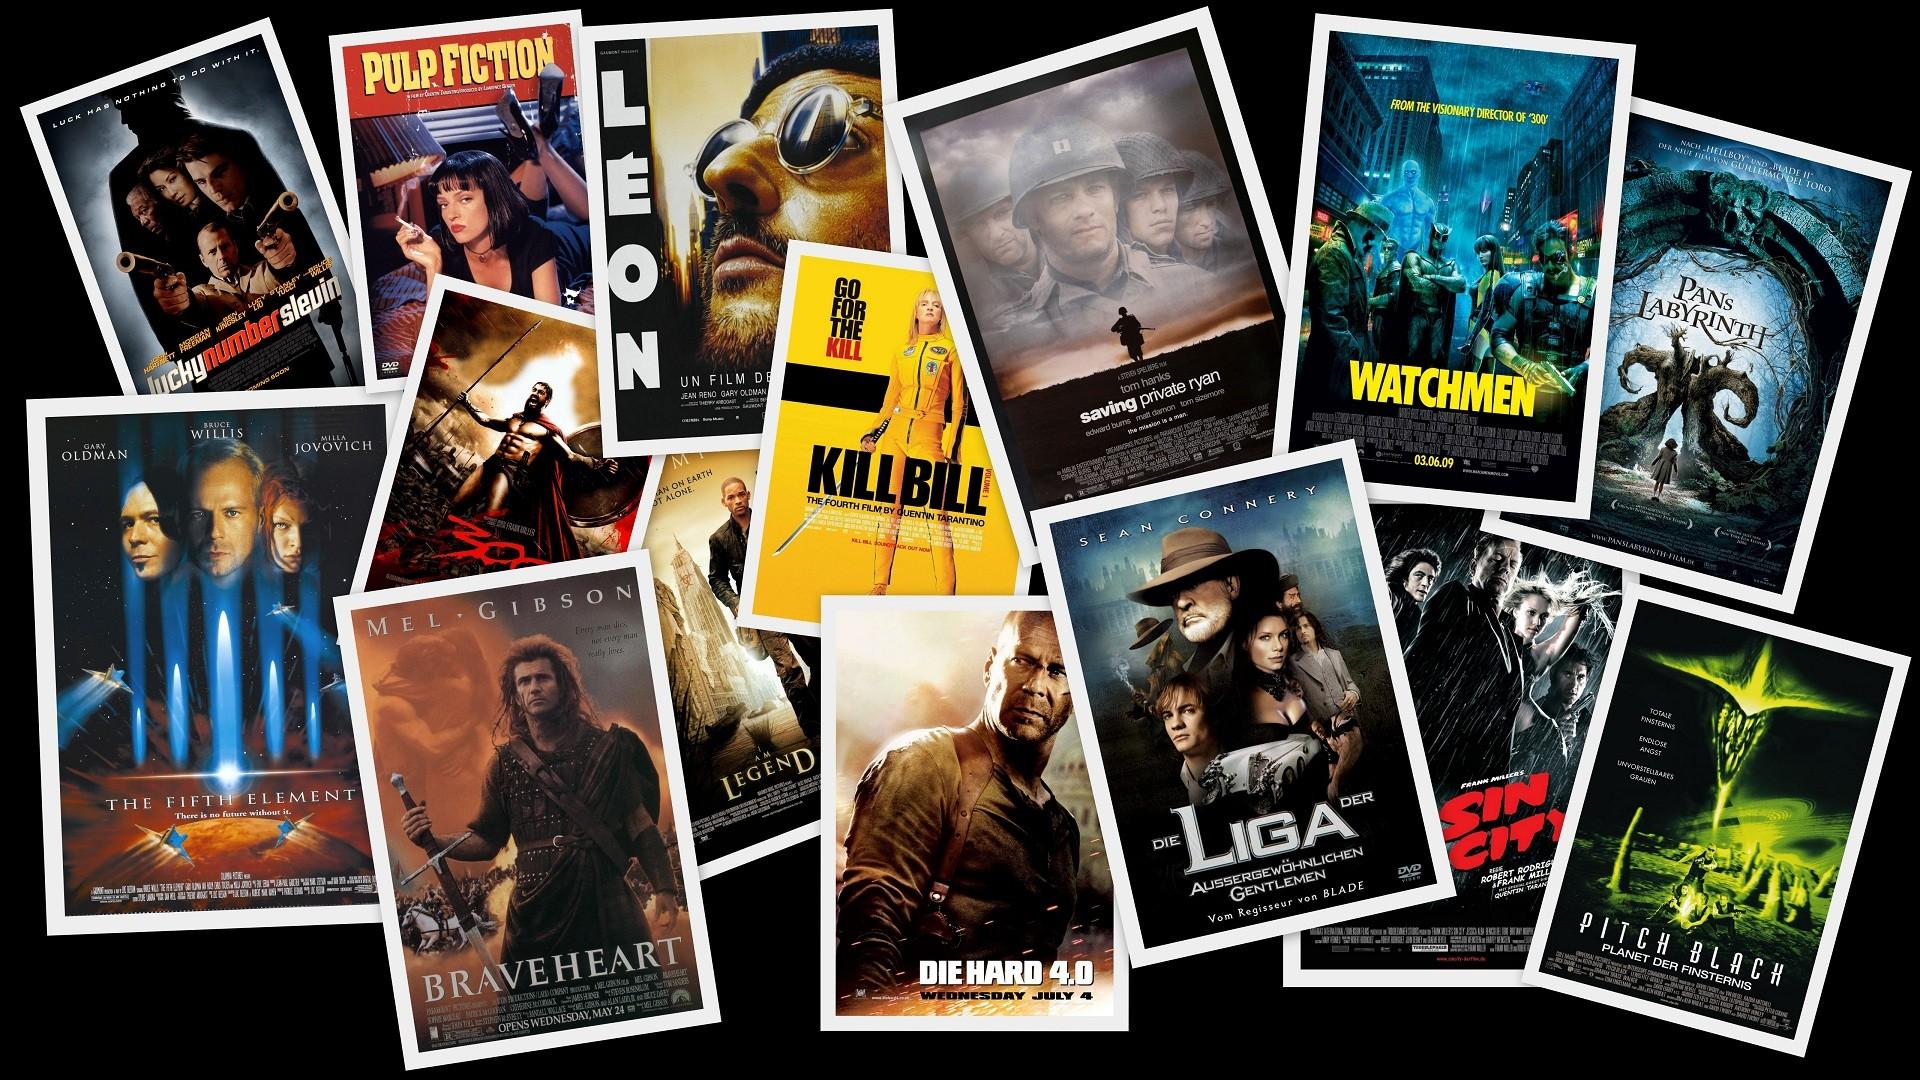 Movies digital art collage movie posters fan art wallpaper 1920x1080 1920x1080